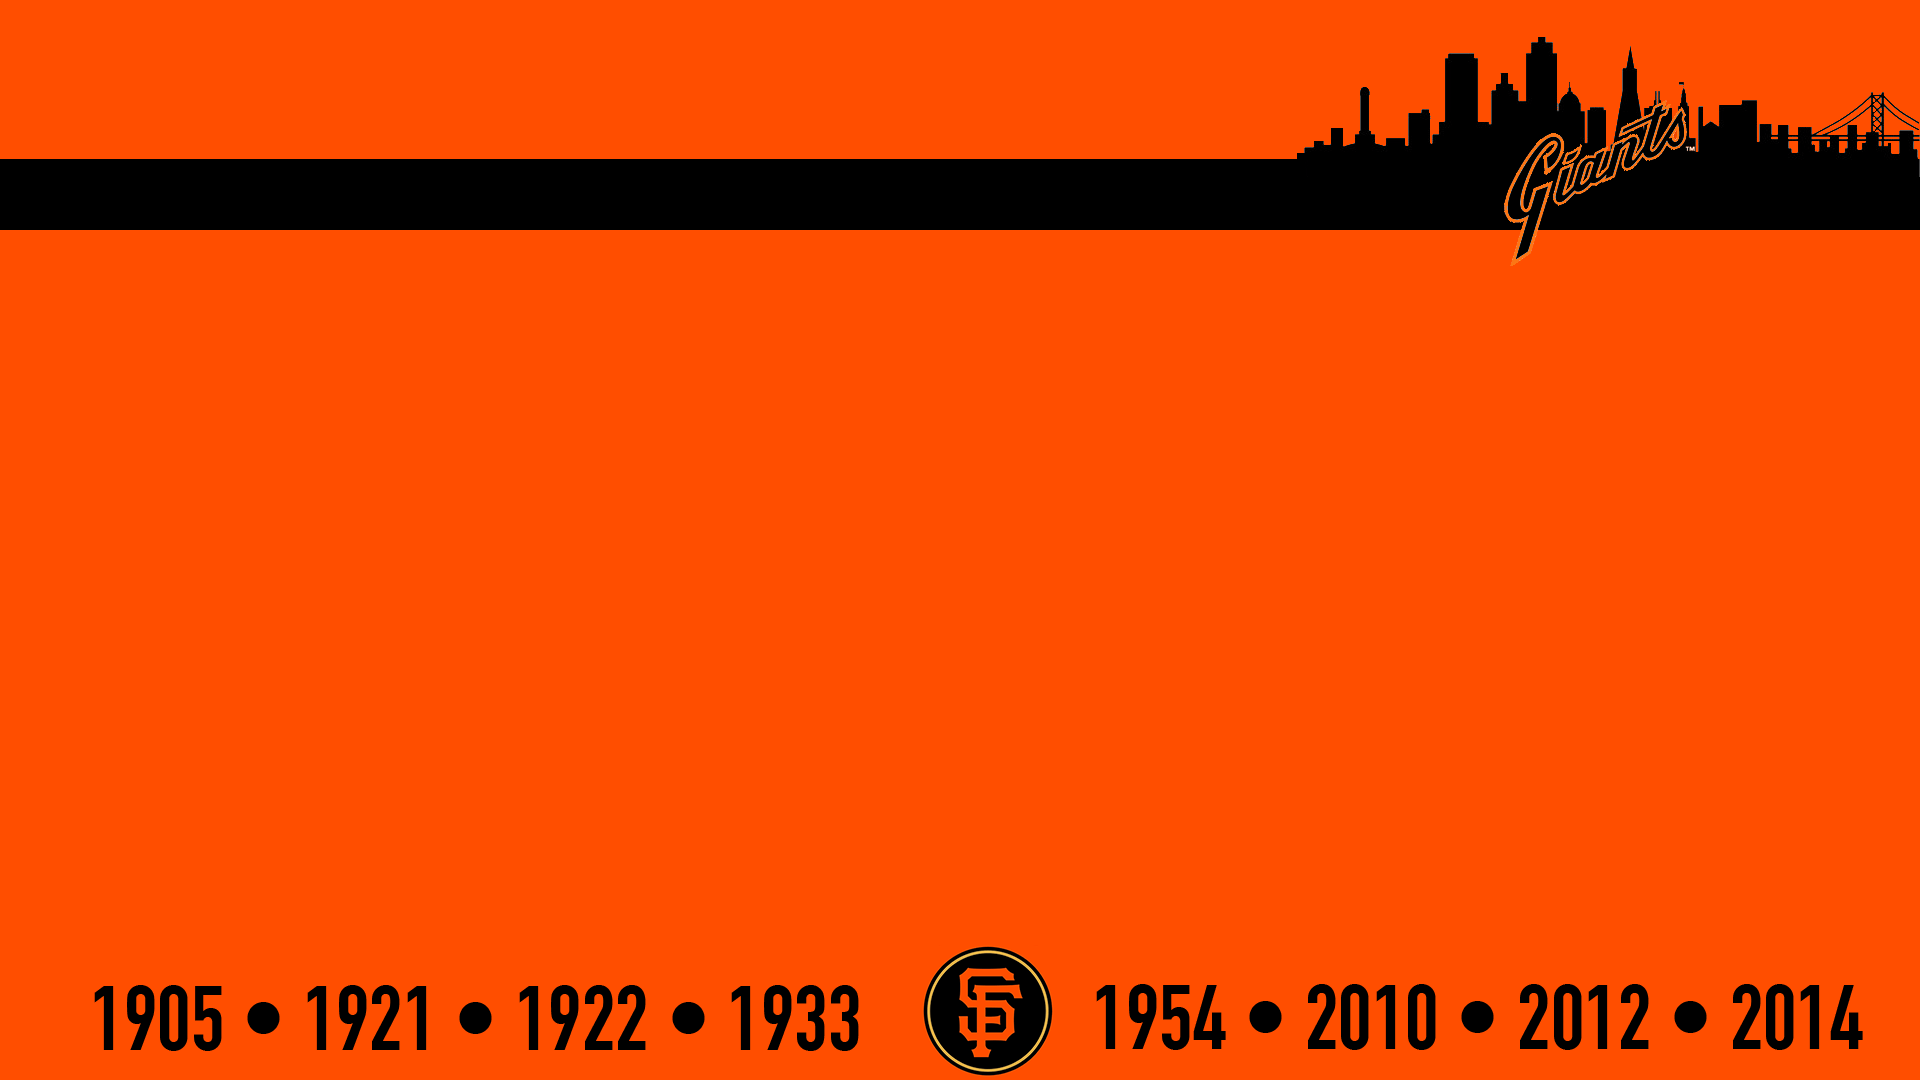 Sf Giants 2016 Schedule Wallpapers 1920x1080